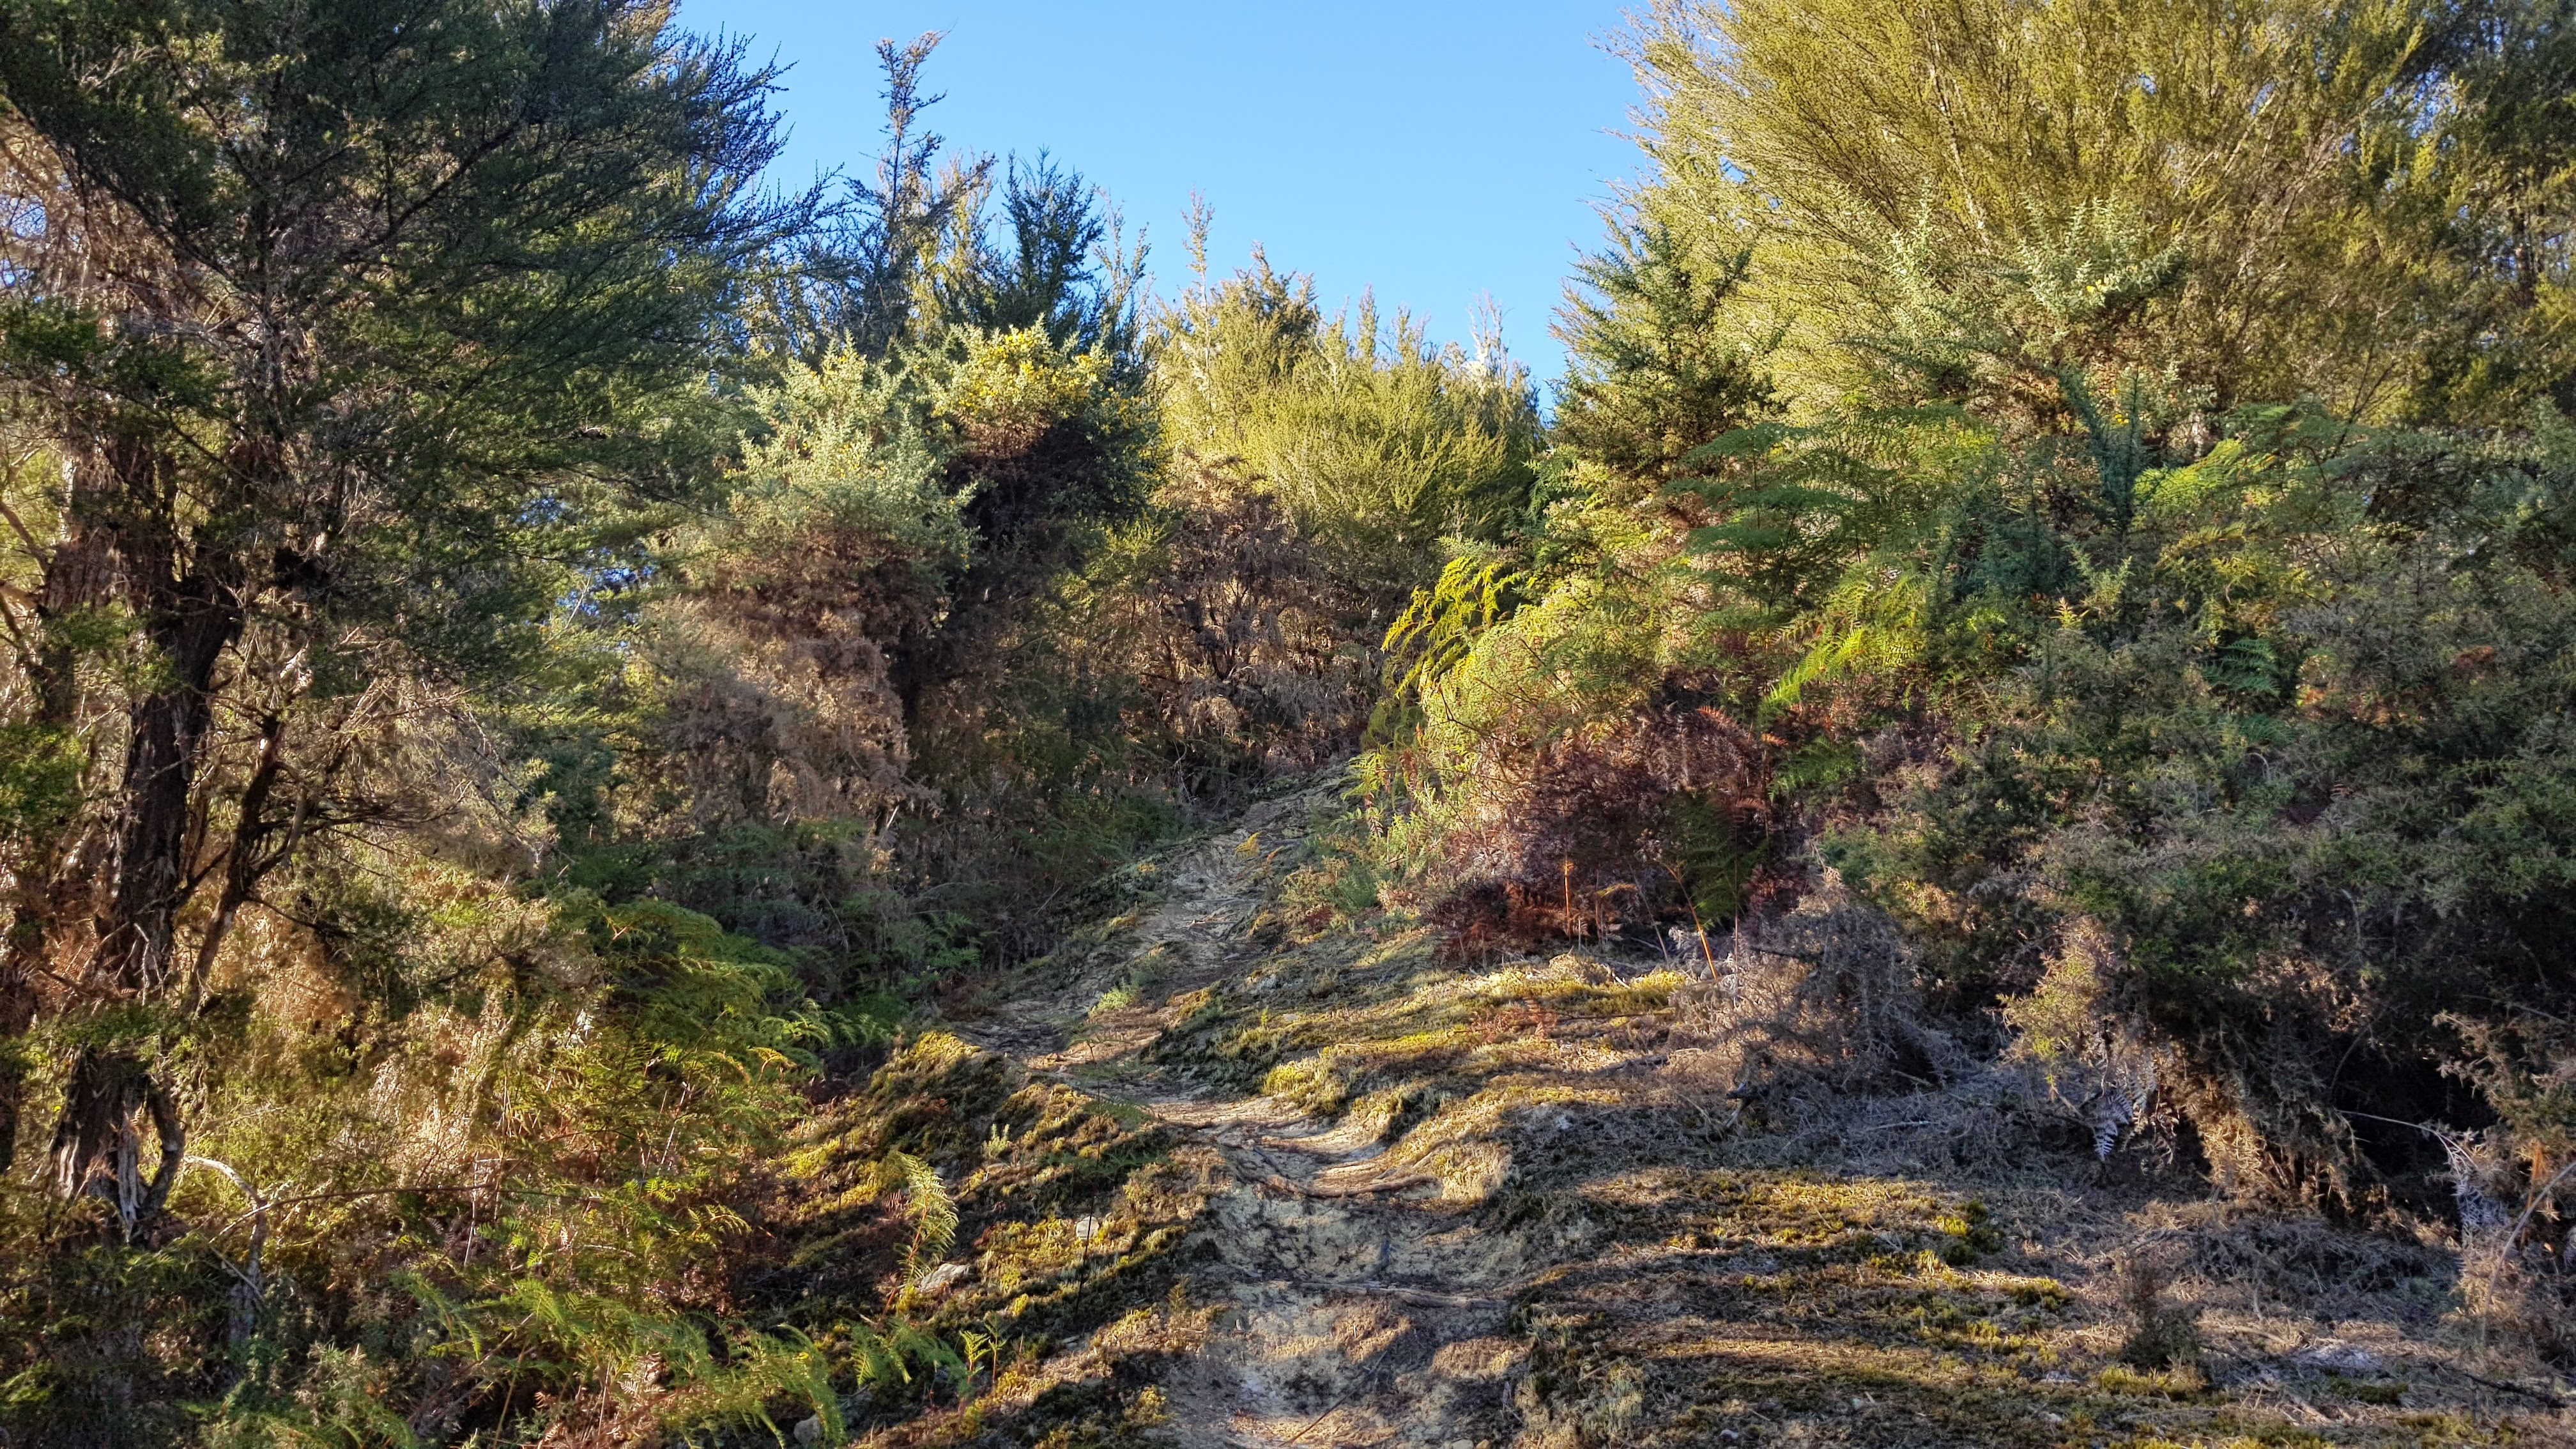 Starting the ridge track to Mount Owen